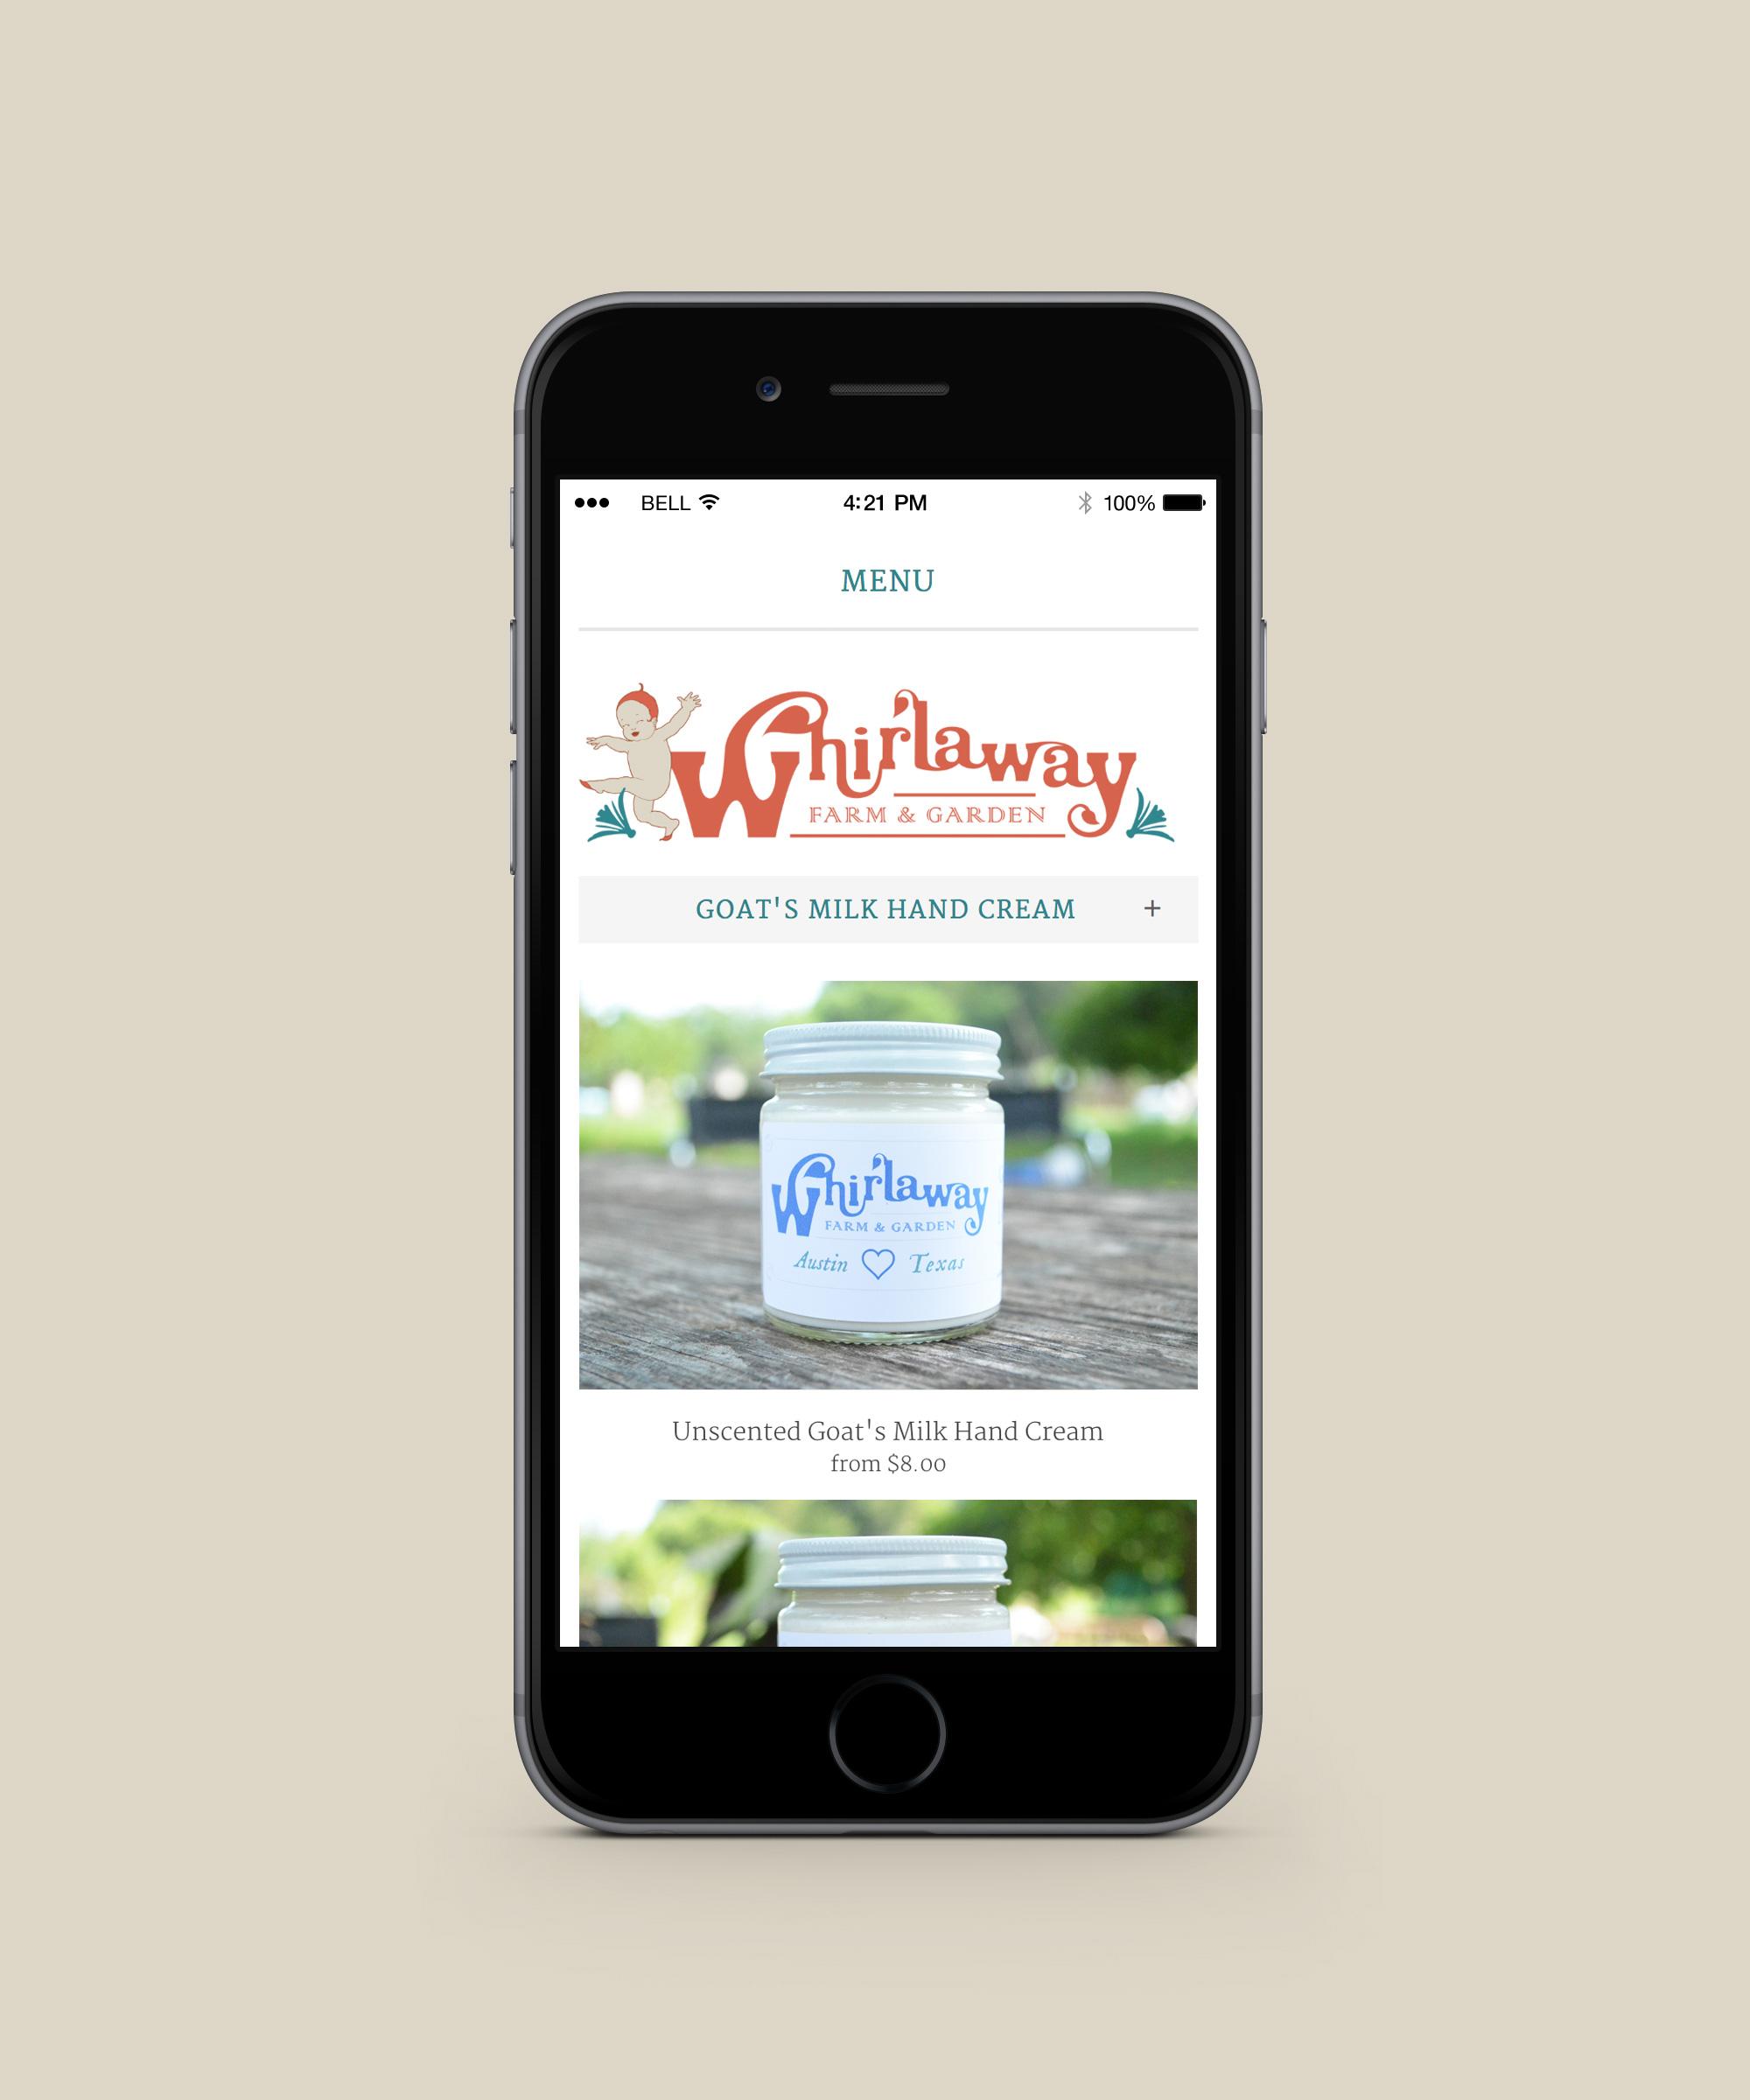 whirlaway_iphone